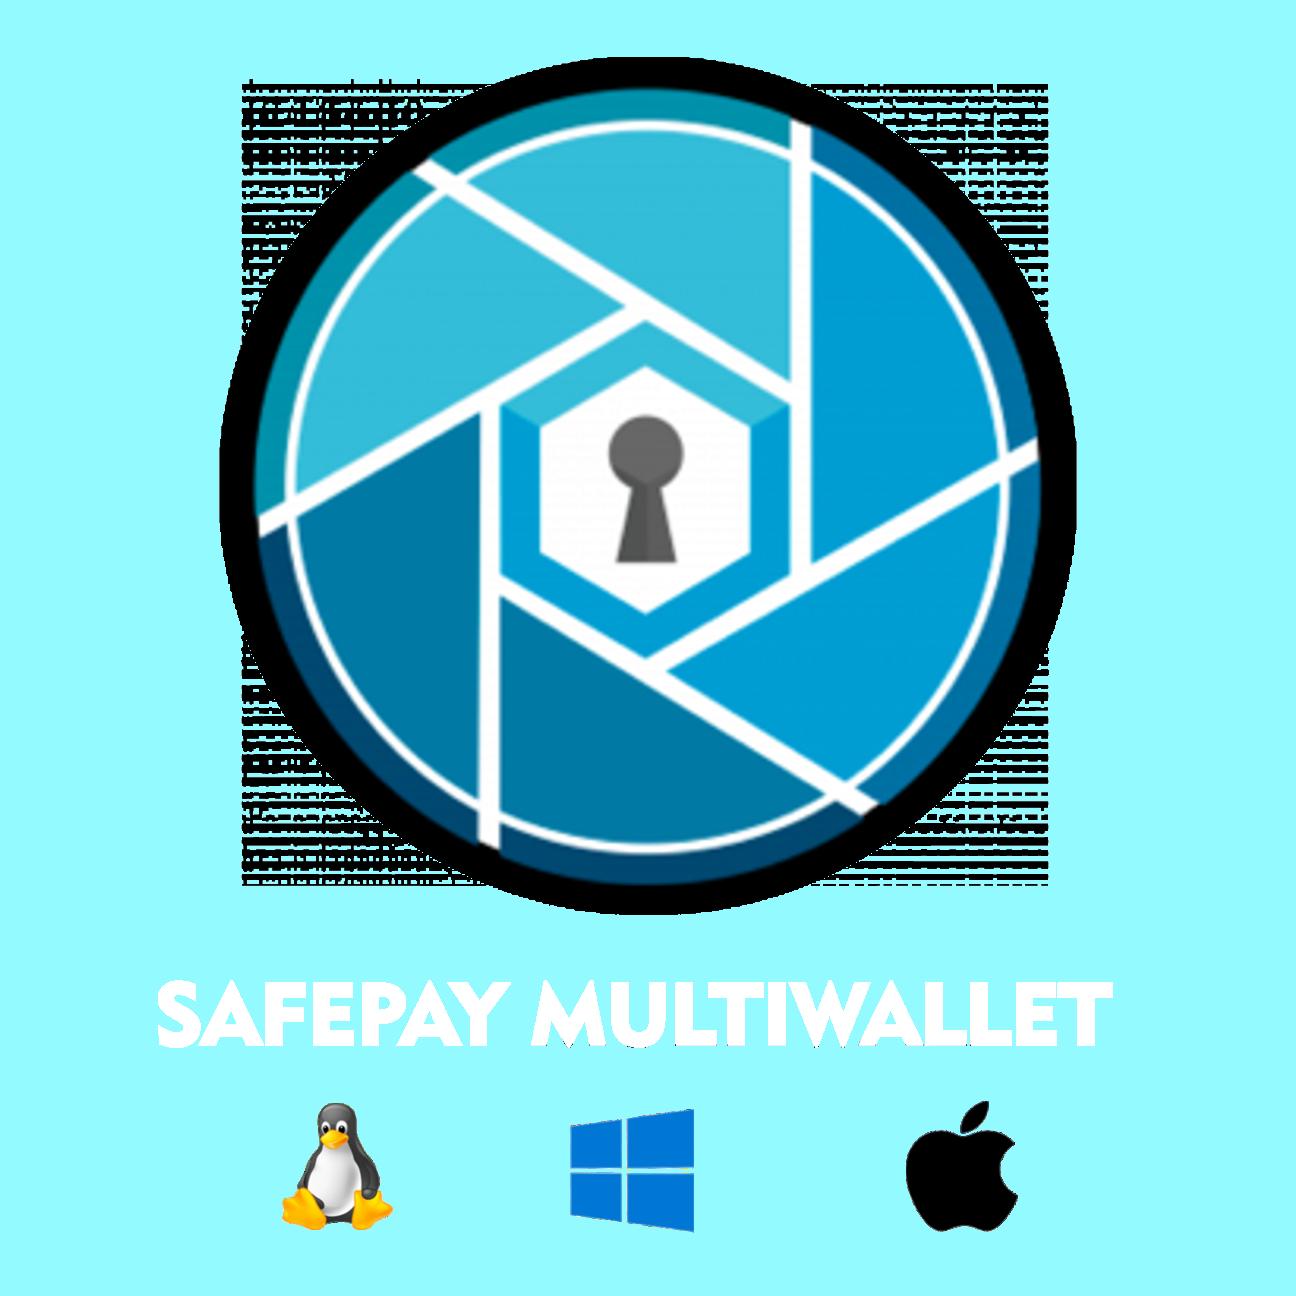 SafePay logo